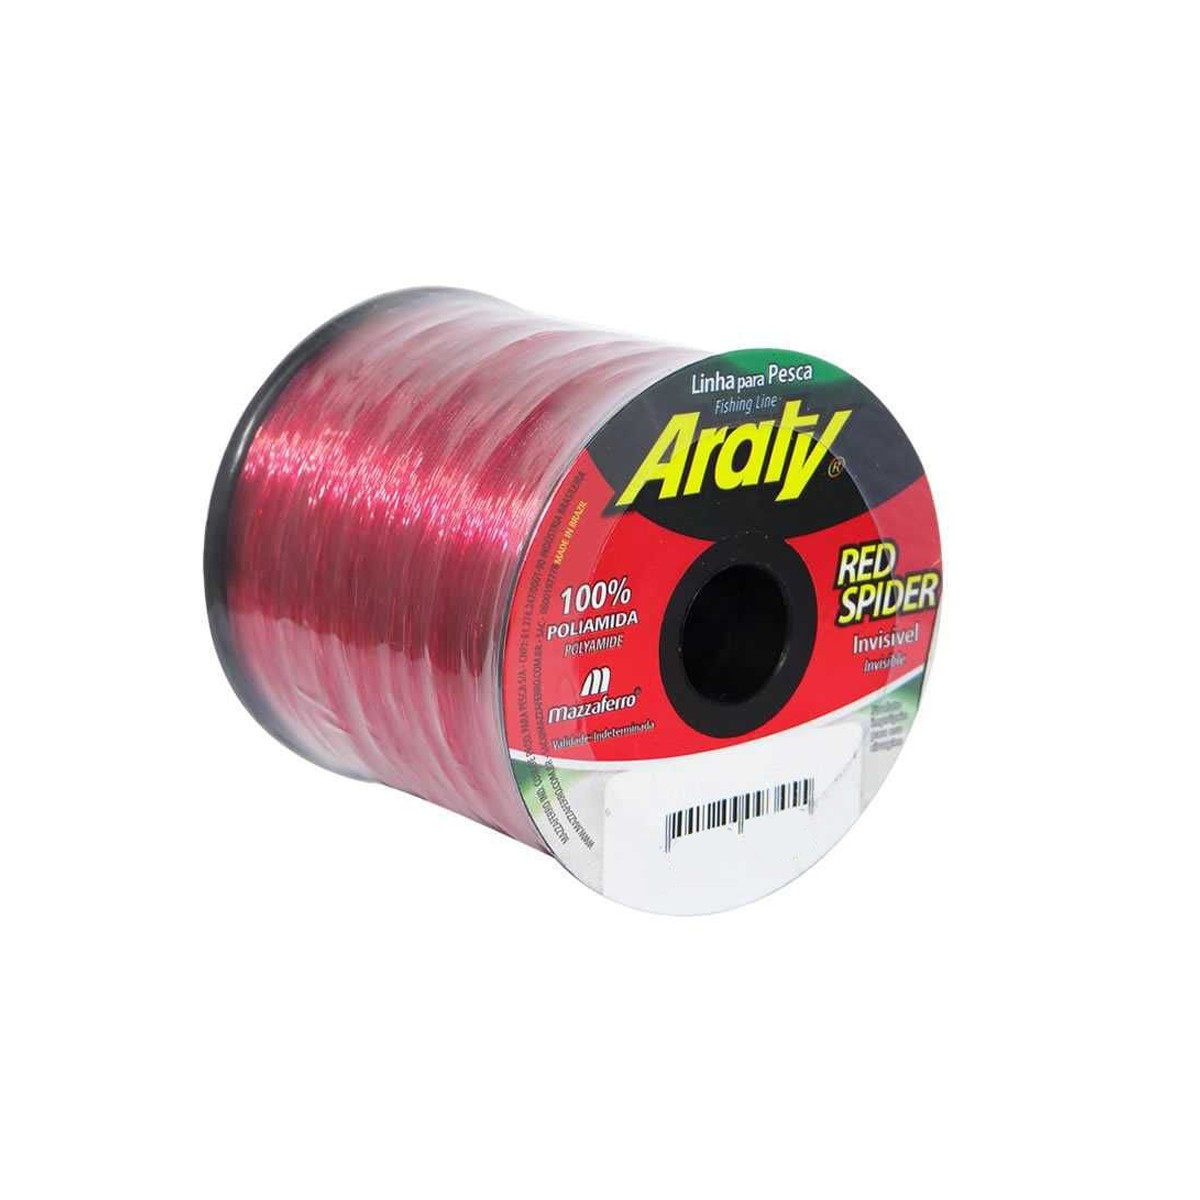 Linha red spider 1240 mts 0,30mm invisÍvel - araty